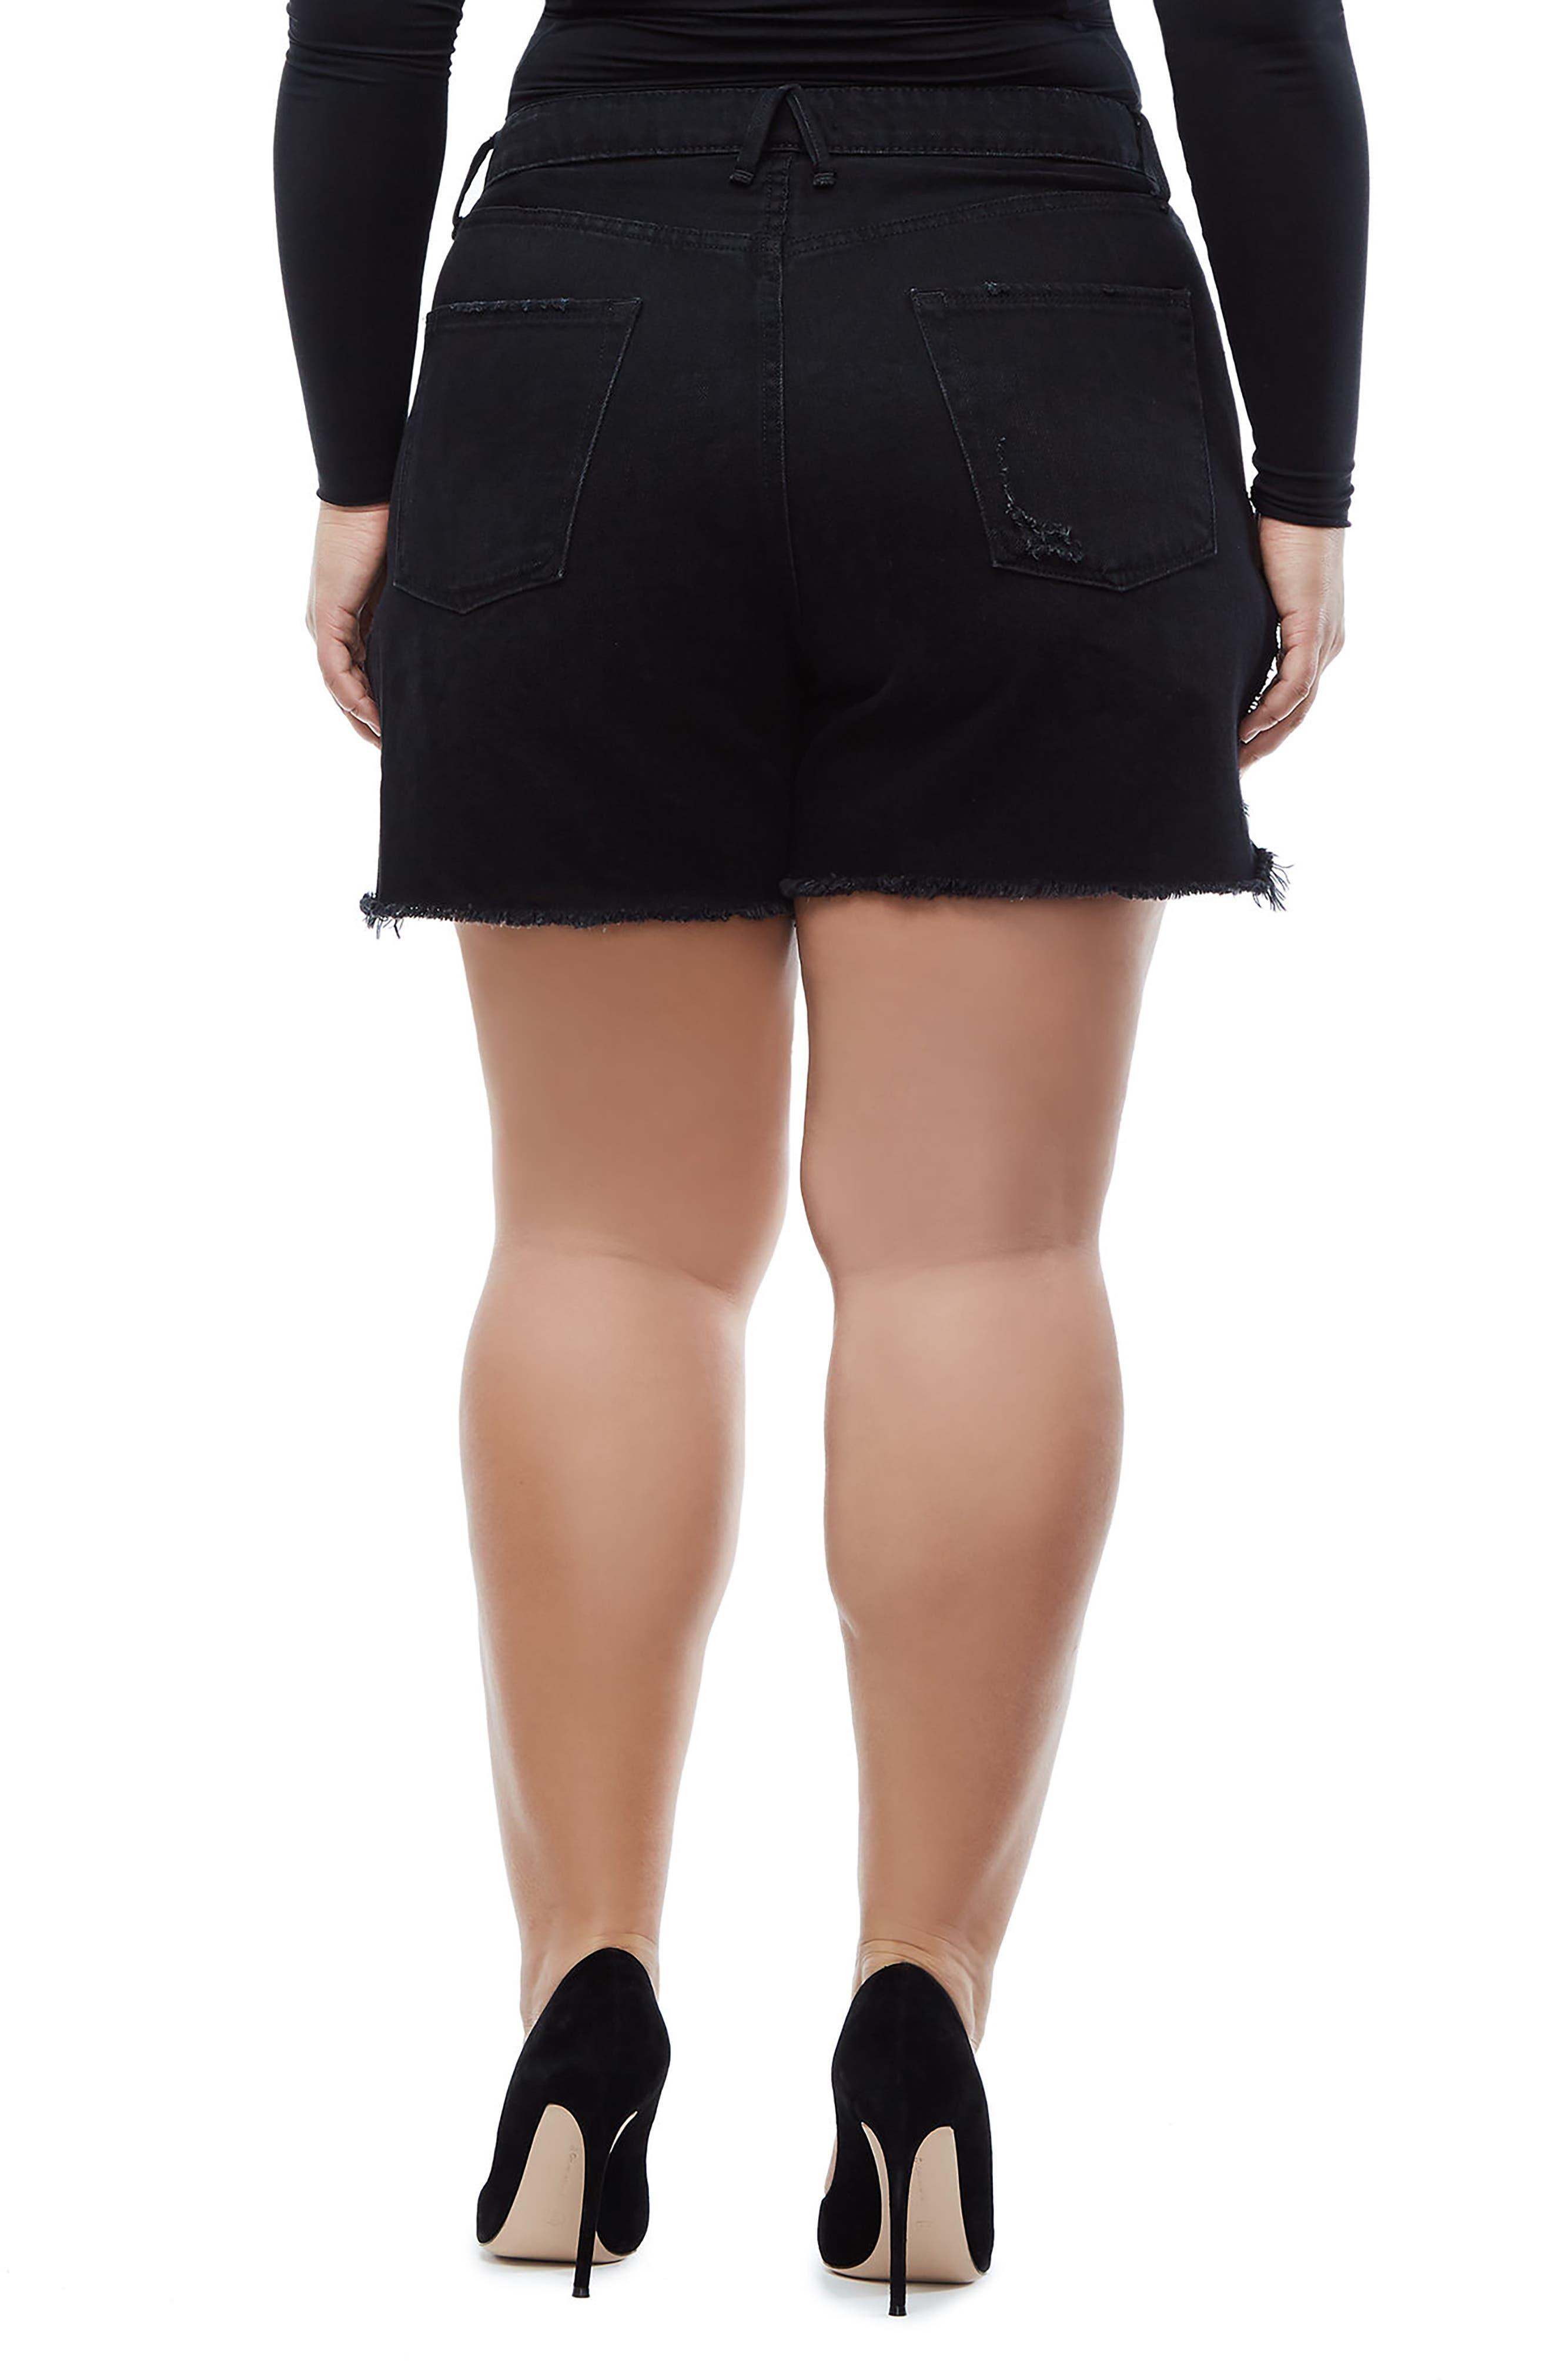 Bombshell High Waist Cutoff Denim Shorts,                             Alternate thumbnail 5, color,                             Black 019